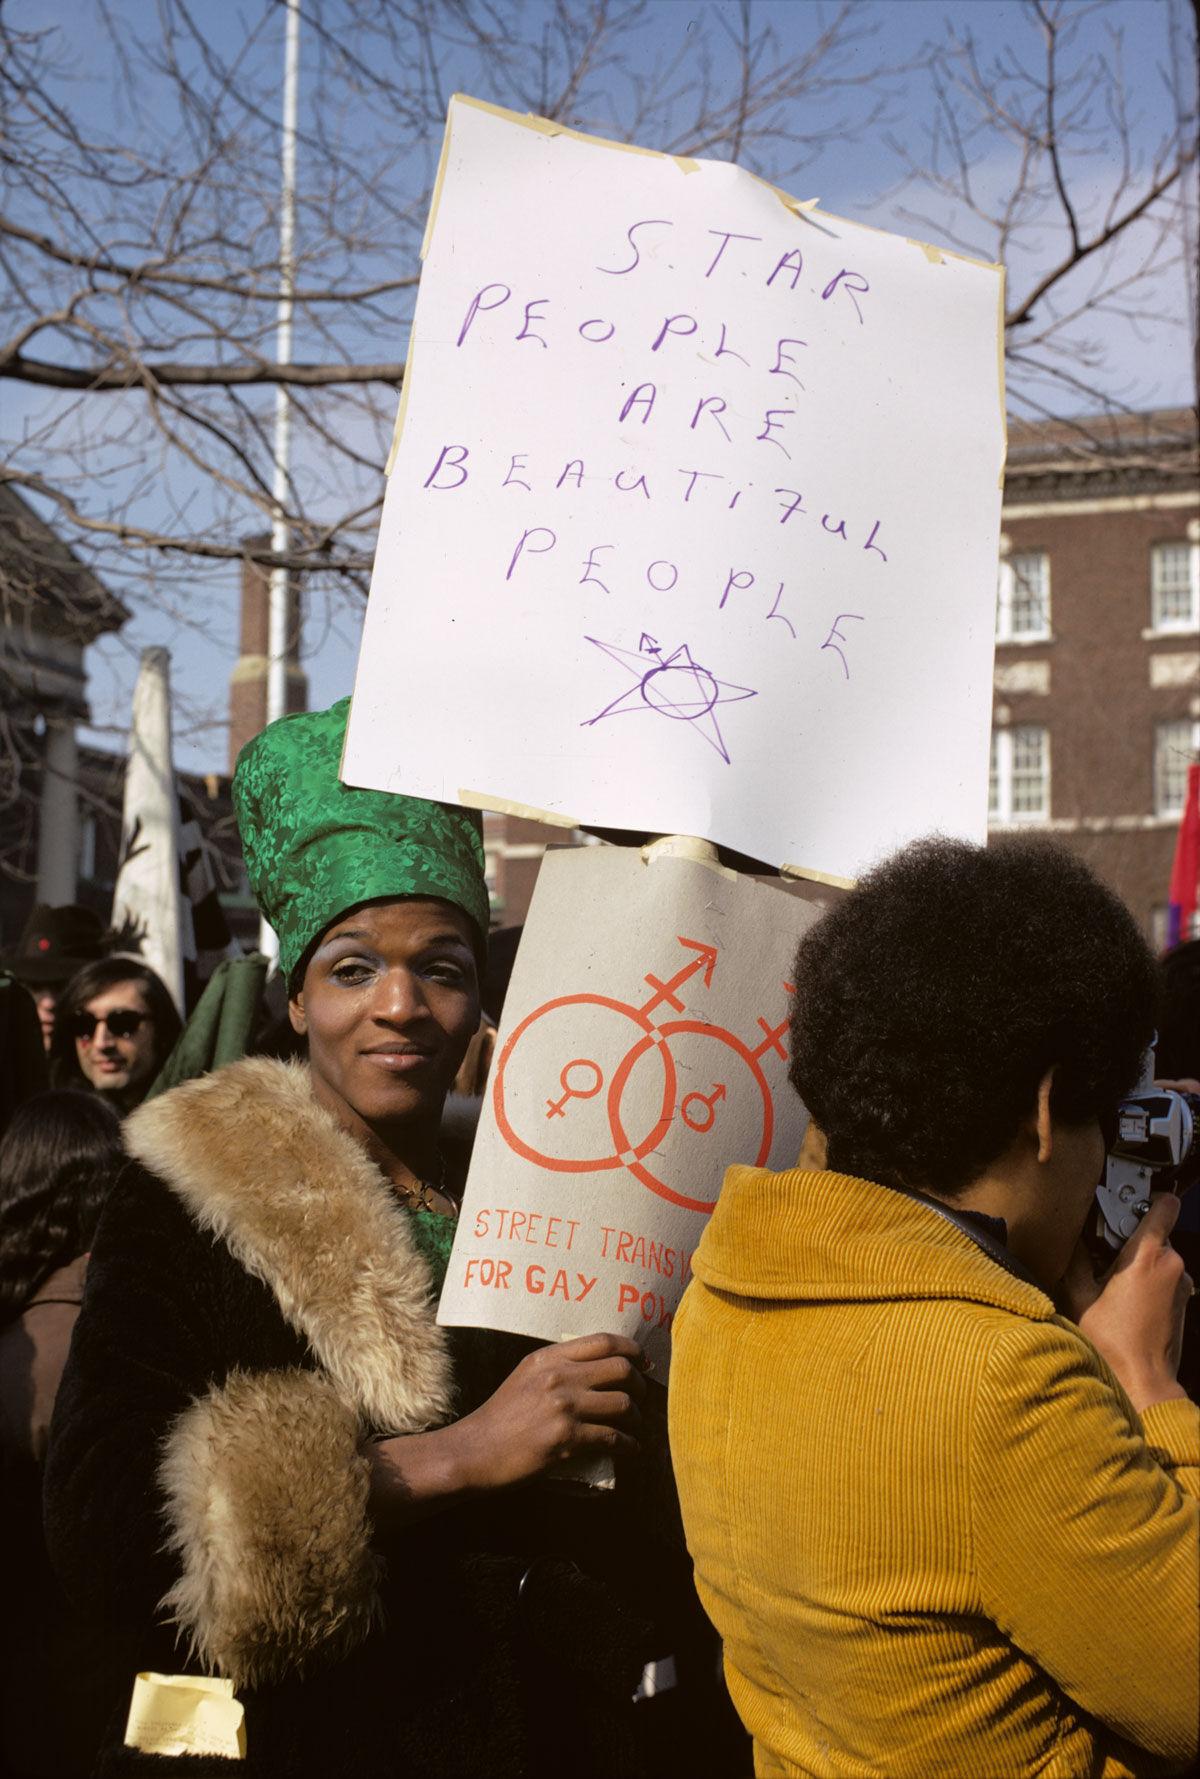 Diana Davies, Gay Rights Demonstrations, Albany, NY, 1971. © The New York Public Library.